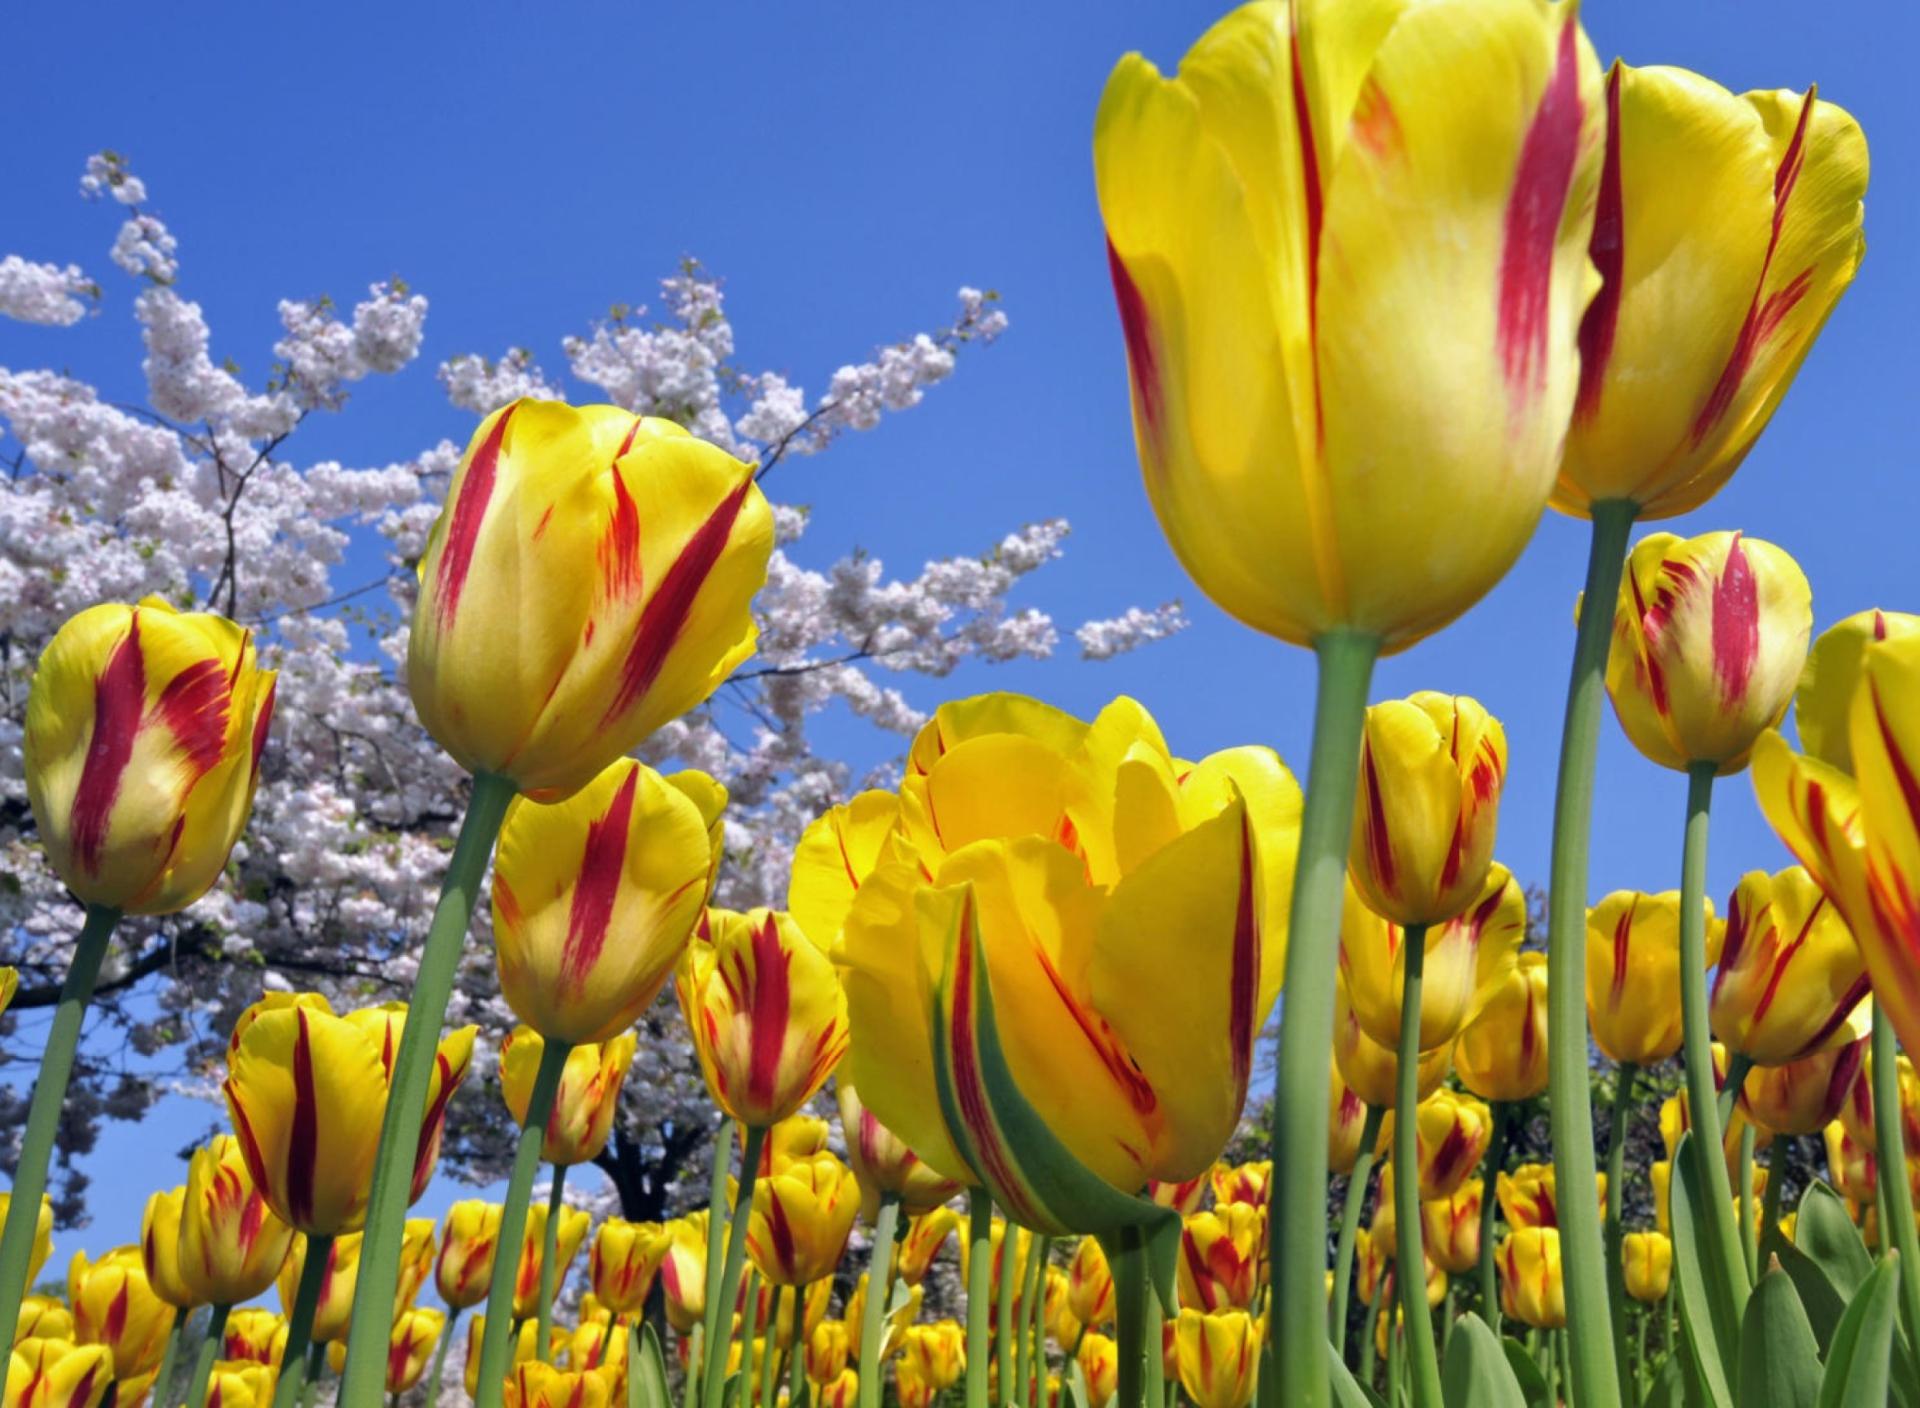 природа цветы тюльпаны желтые nature flowers tulips yellow скачать